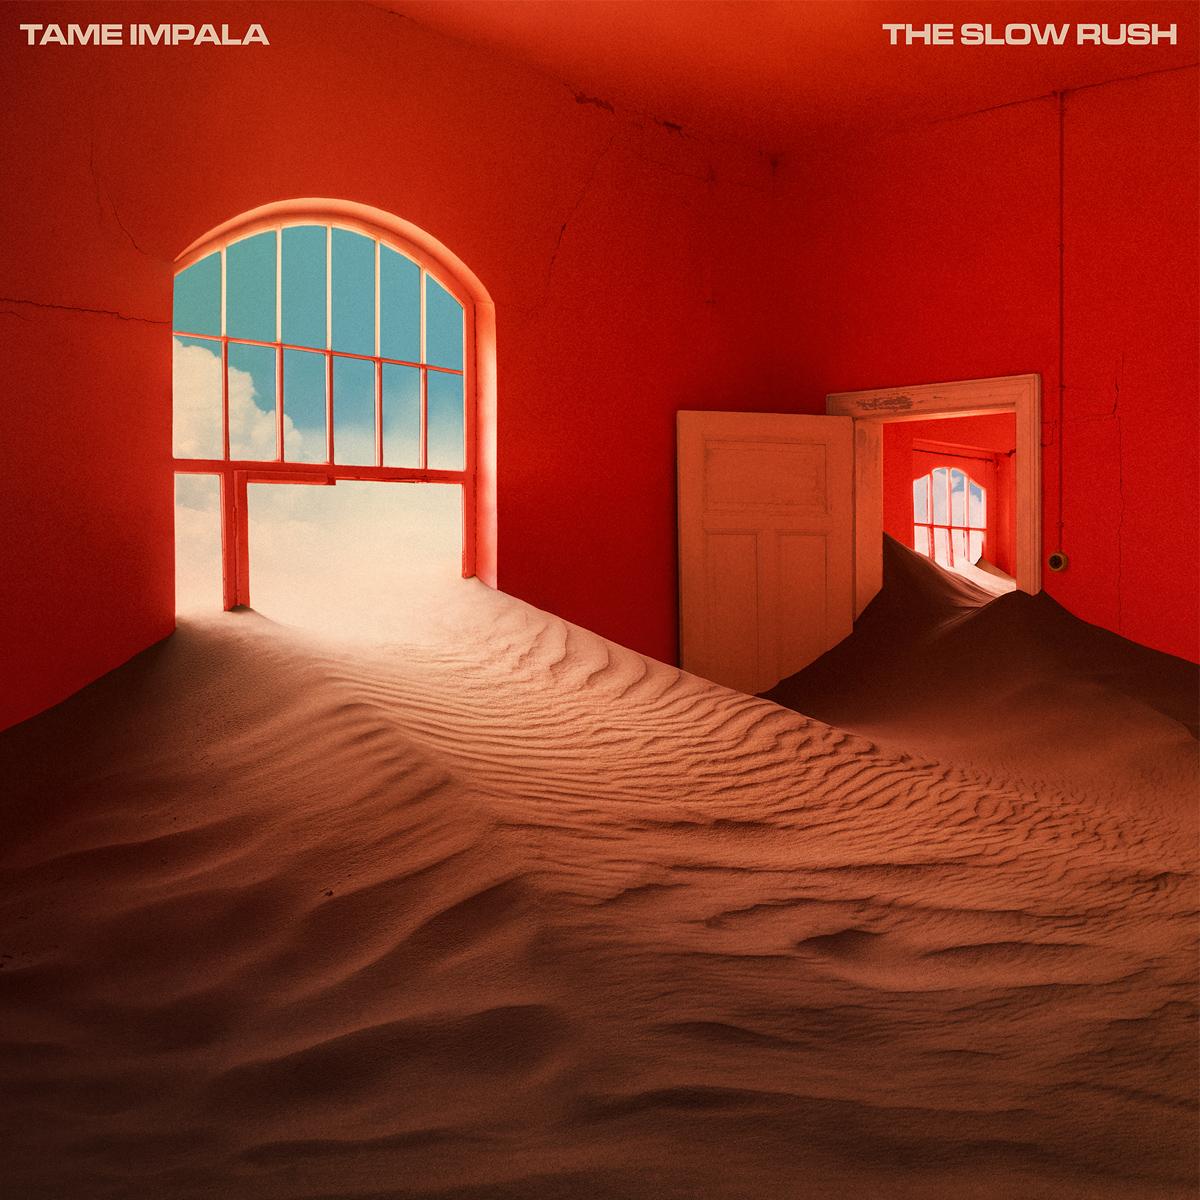 Tame Impala album art The Slow Rush